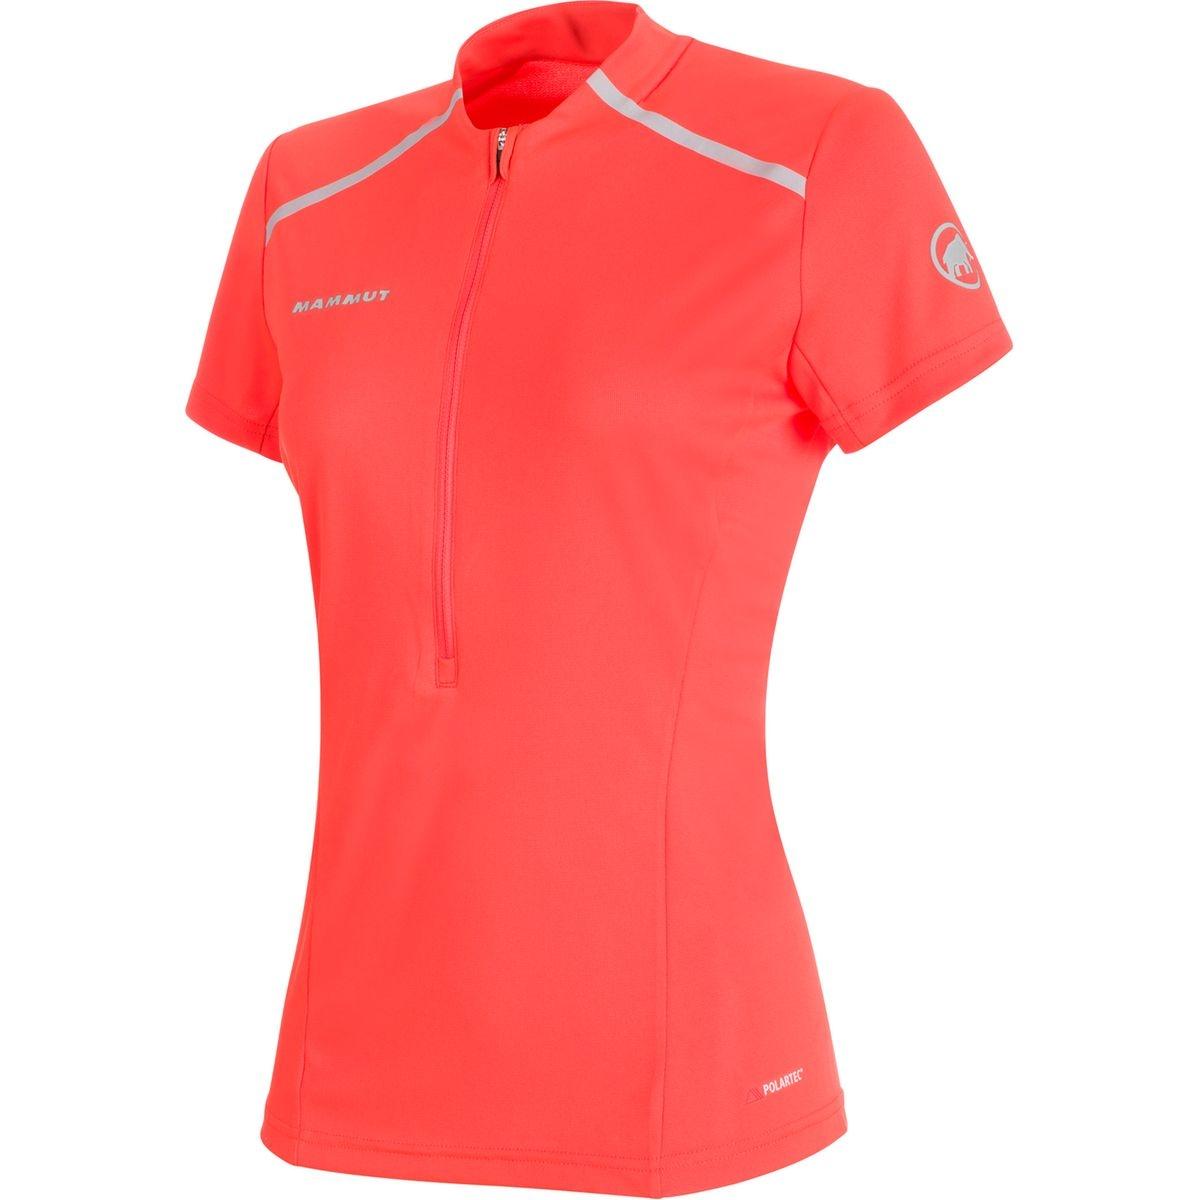 Atacazo Light - T-shirt manches courtes Femme - rouge